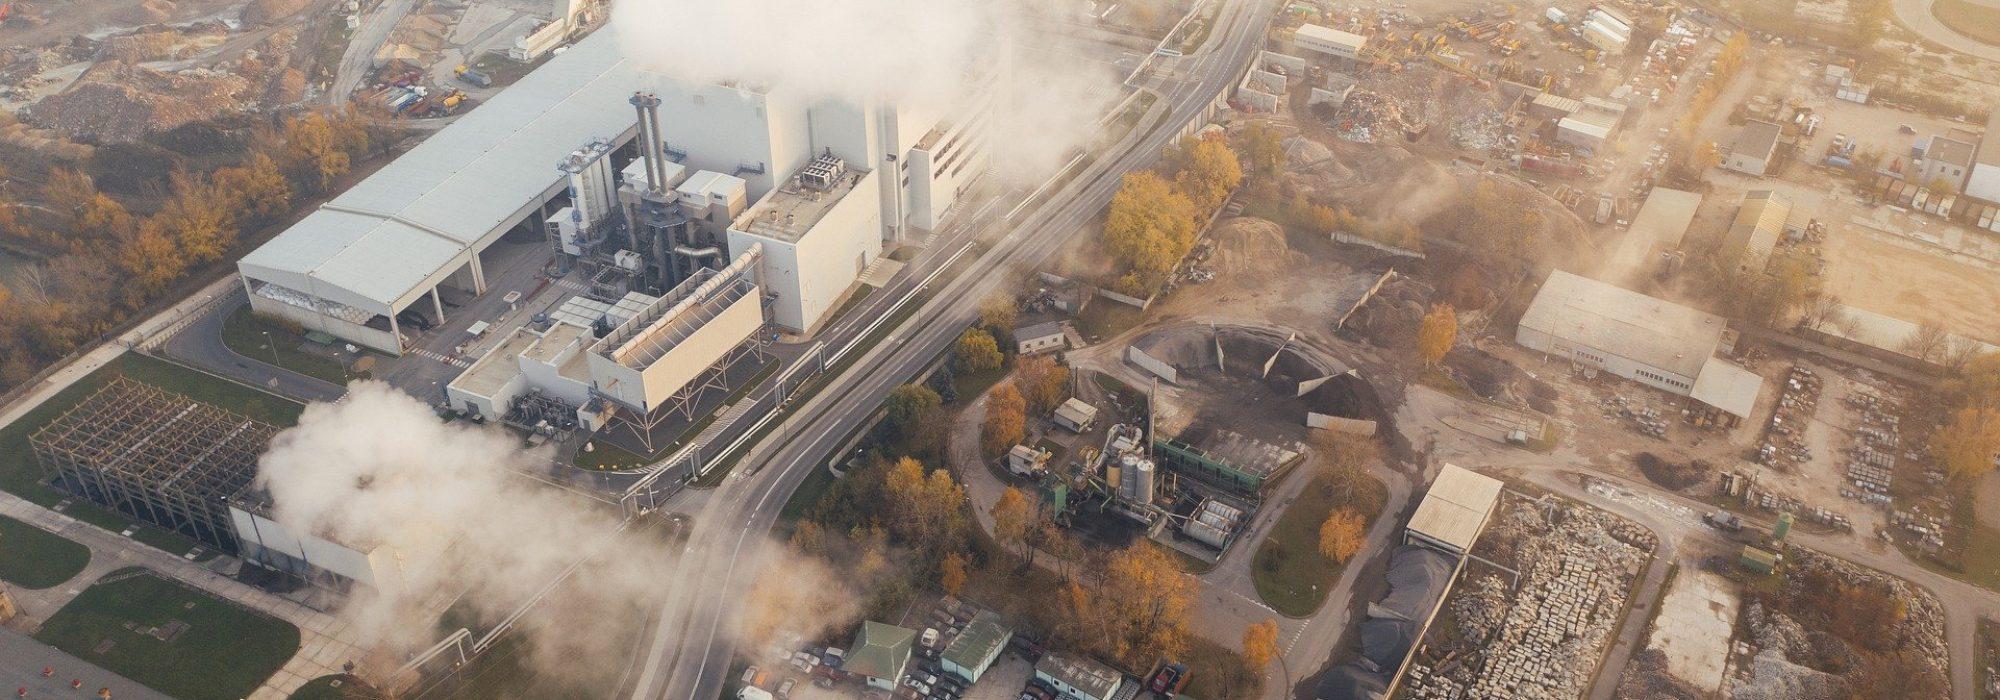 pollution-4796858_1920